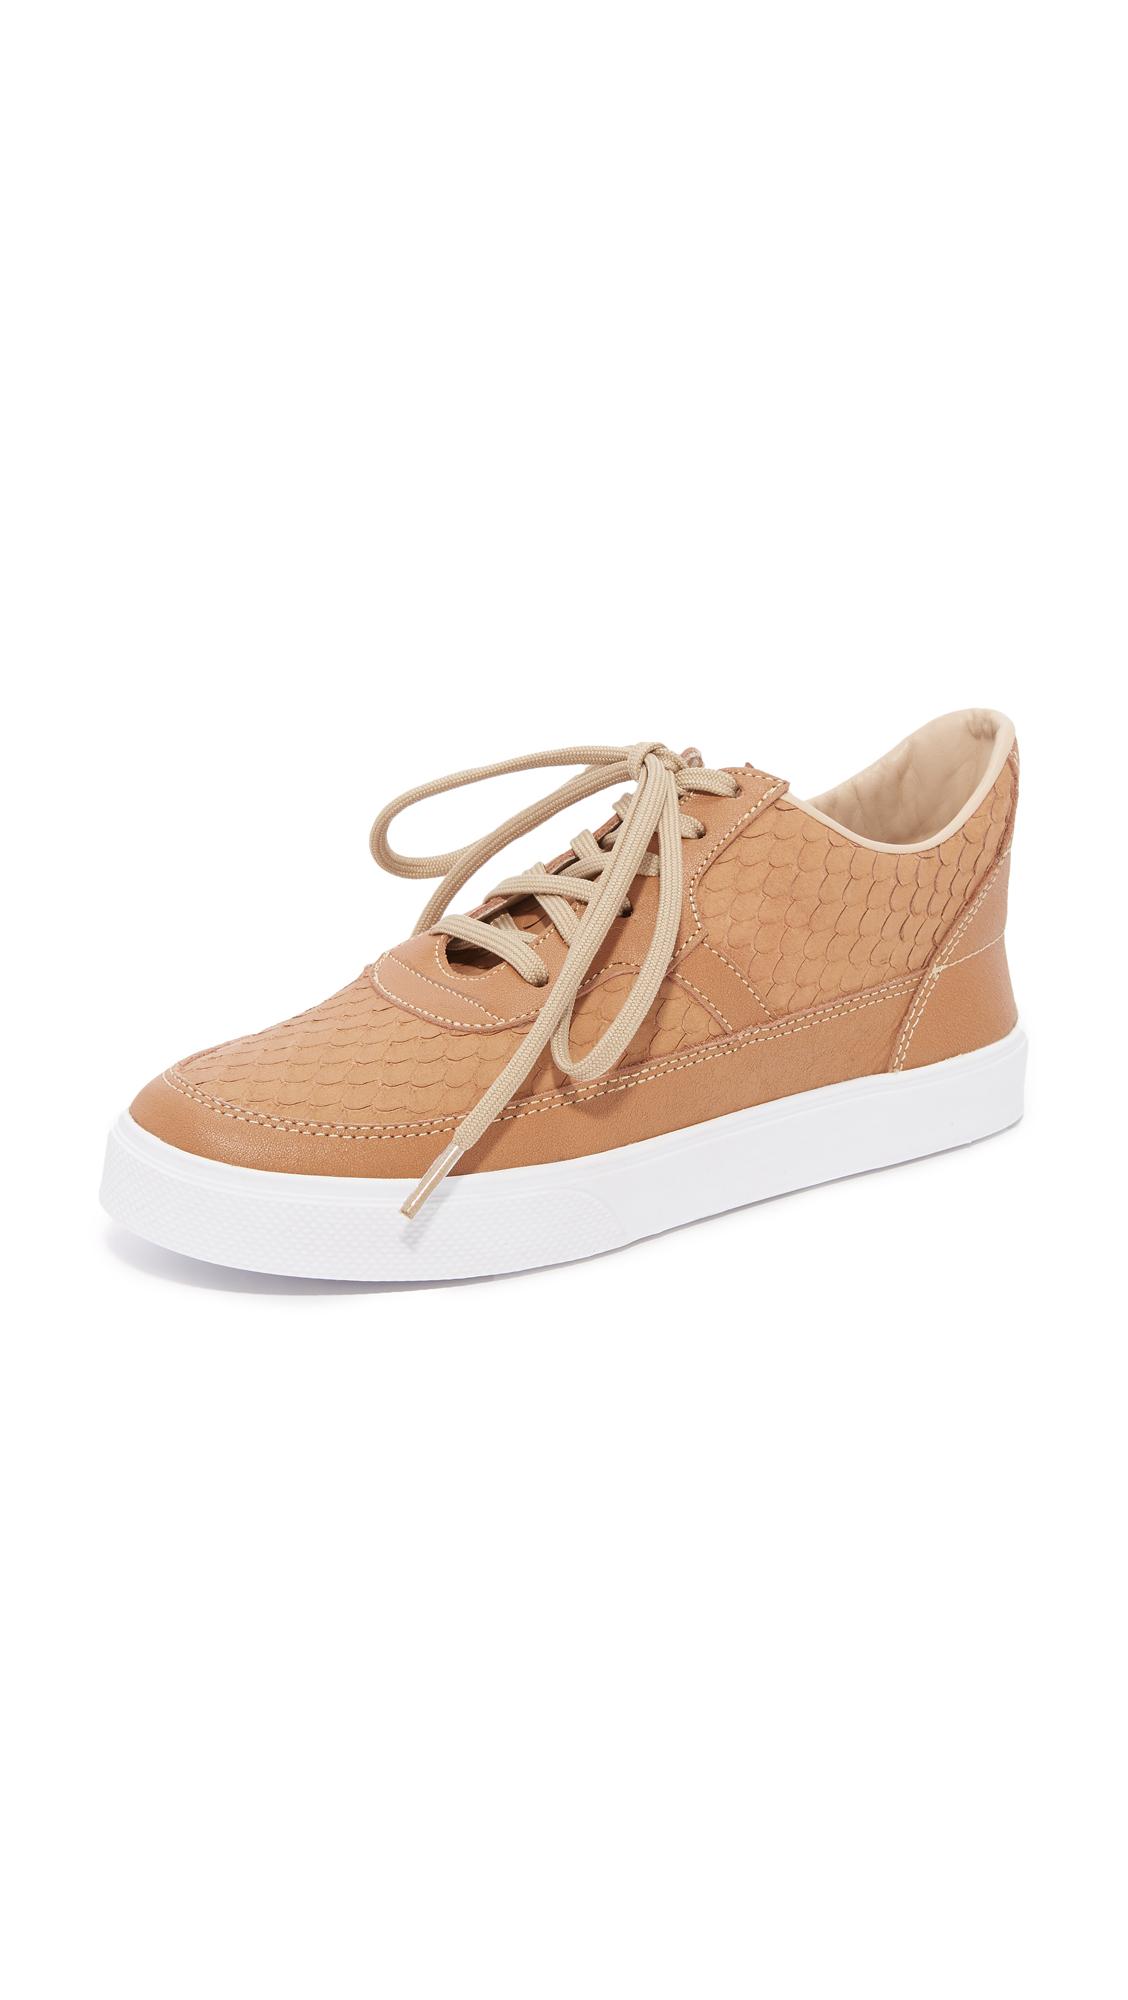 KAANAS Sonora Sneakers - Caramel